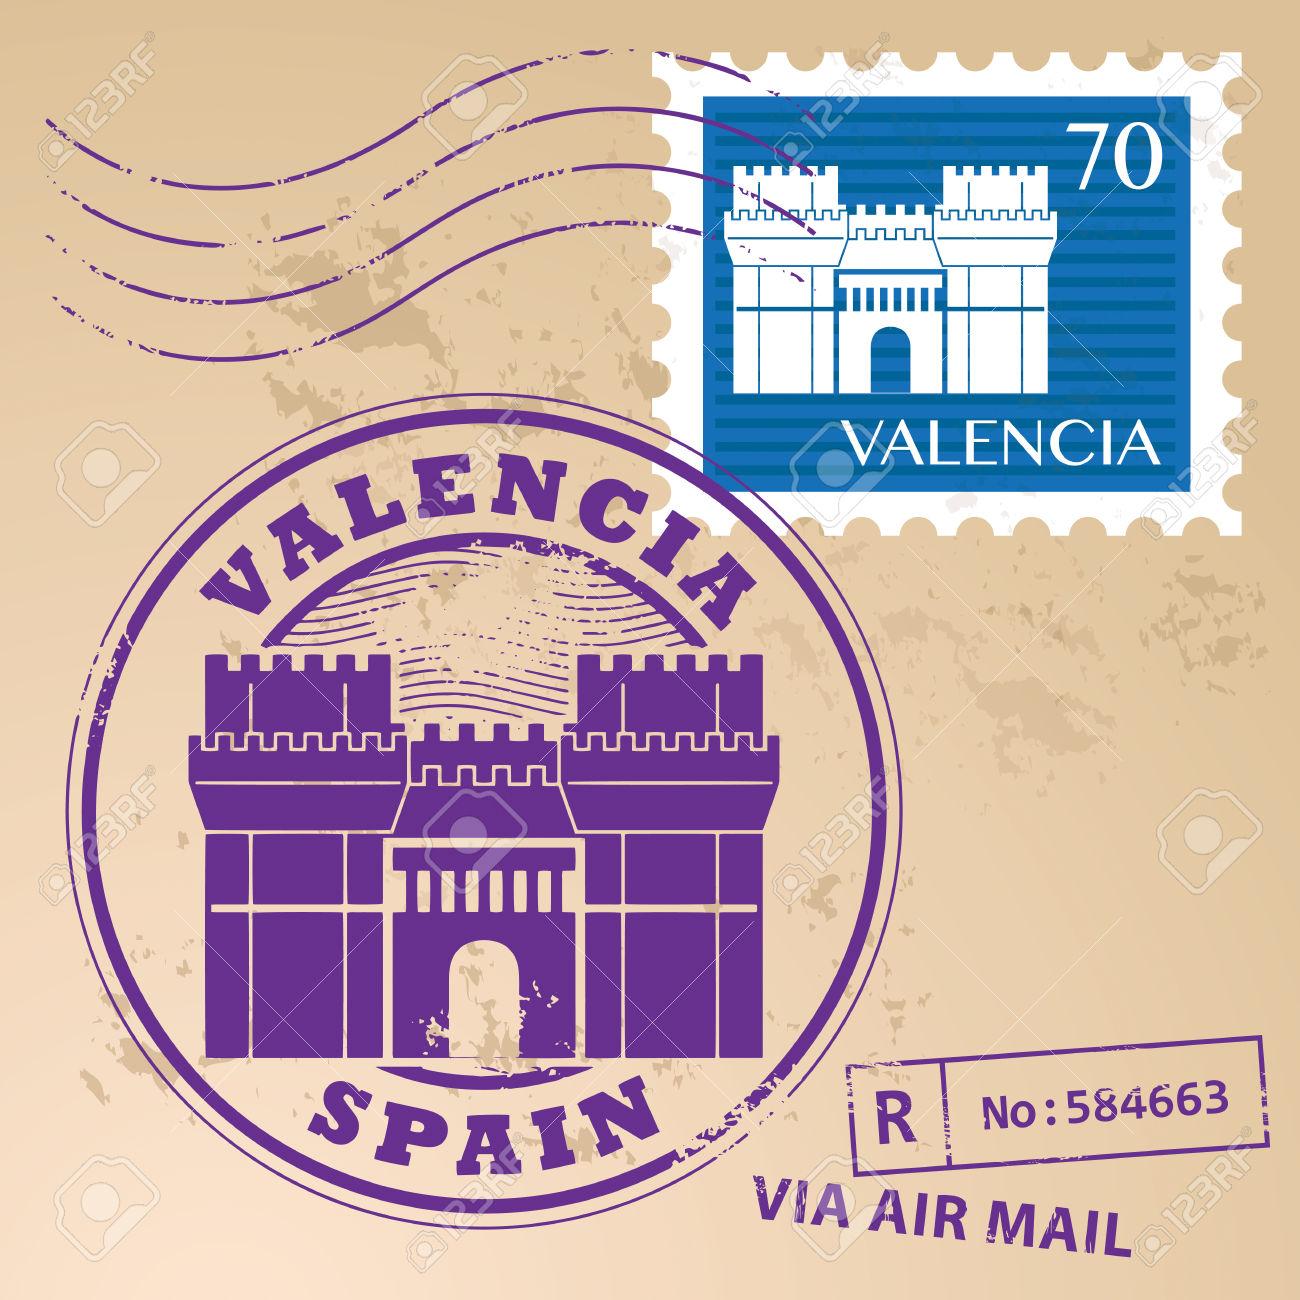 Clipart valencia.